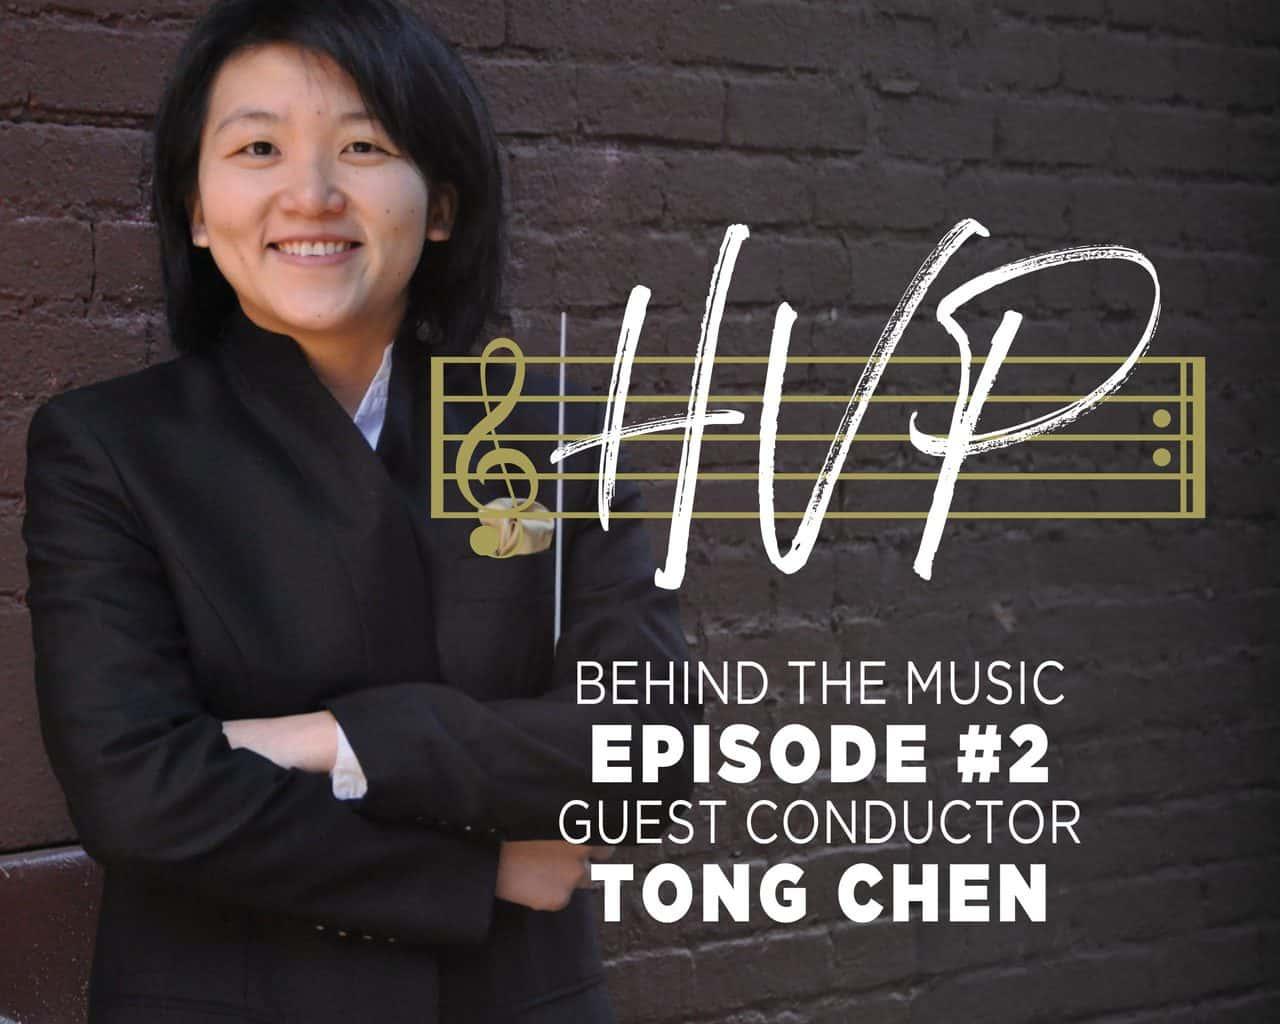 HVP: BEHIND THE MUSIC #2